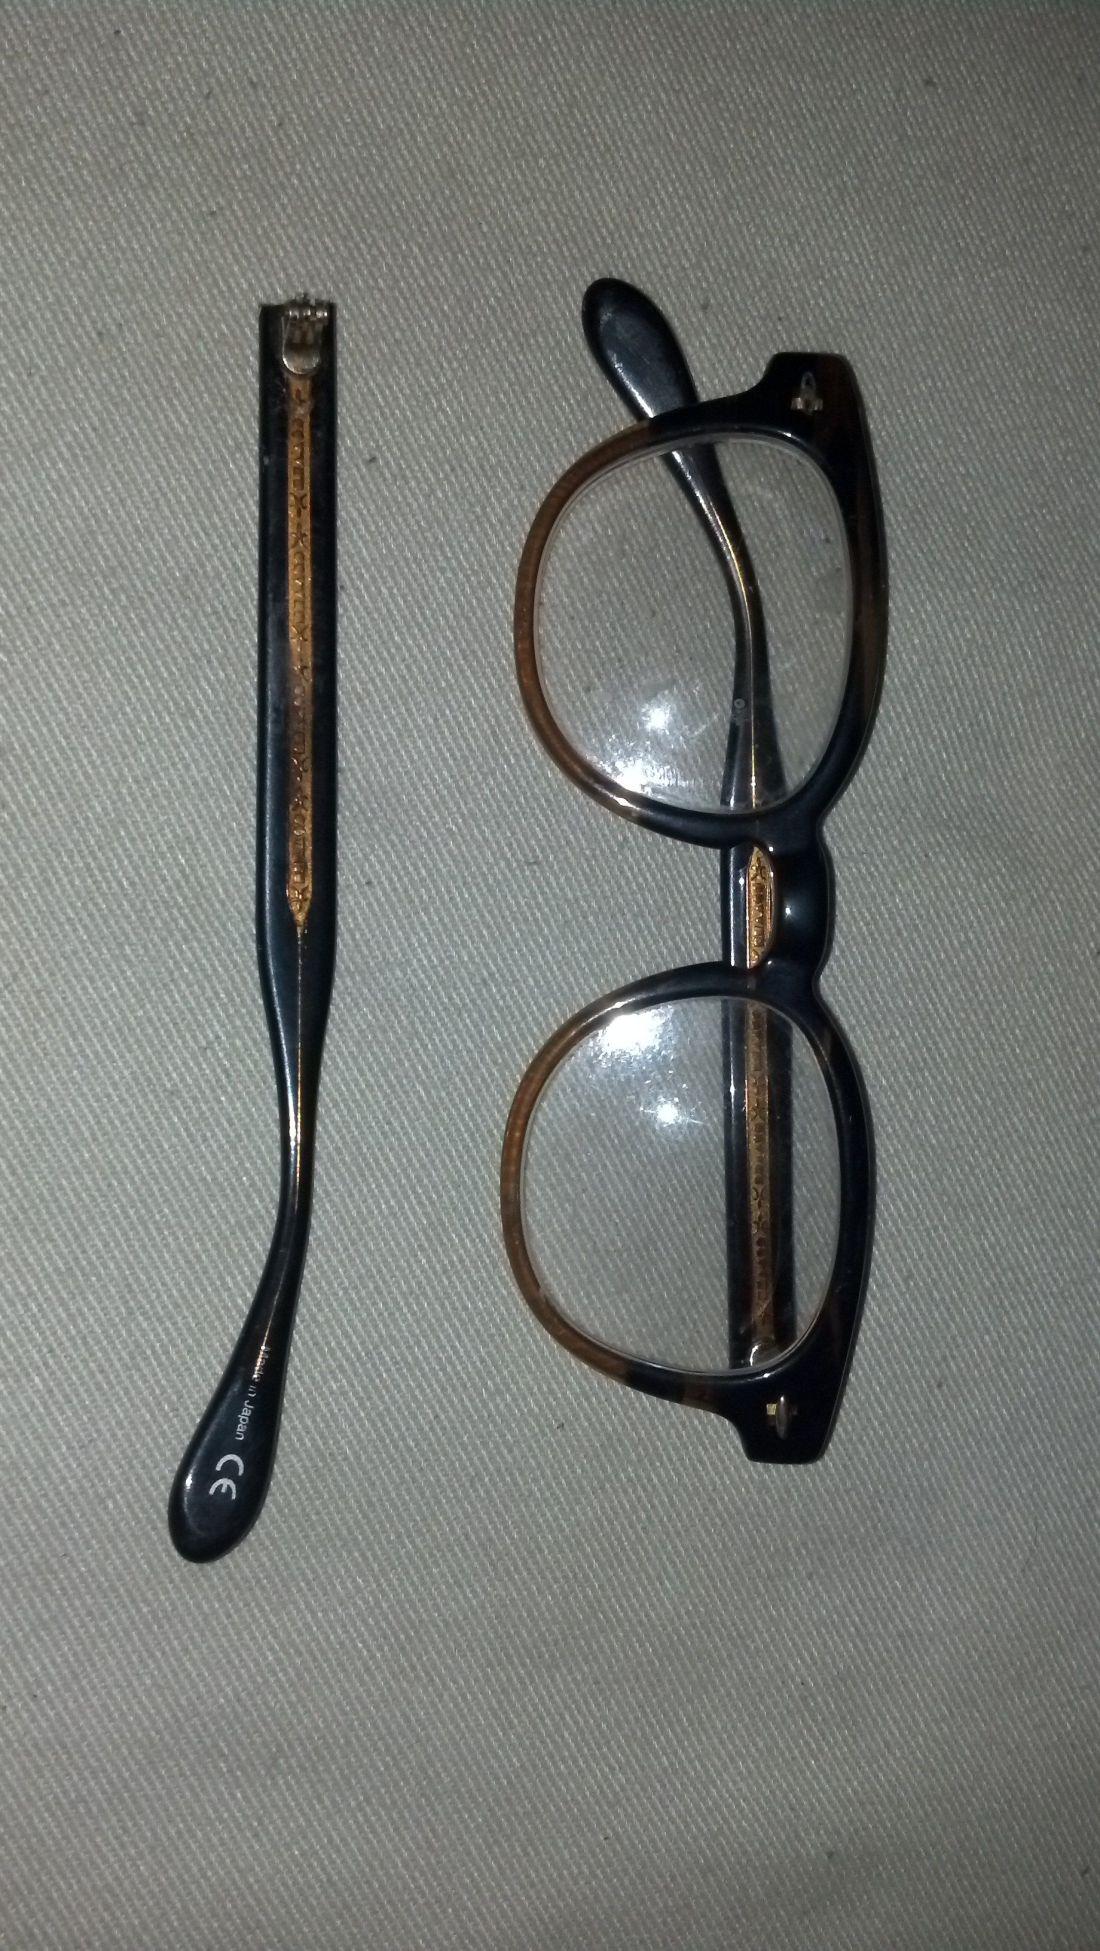 Before shot of plastic eyeglasses with broken temple arm